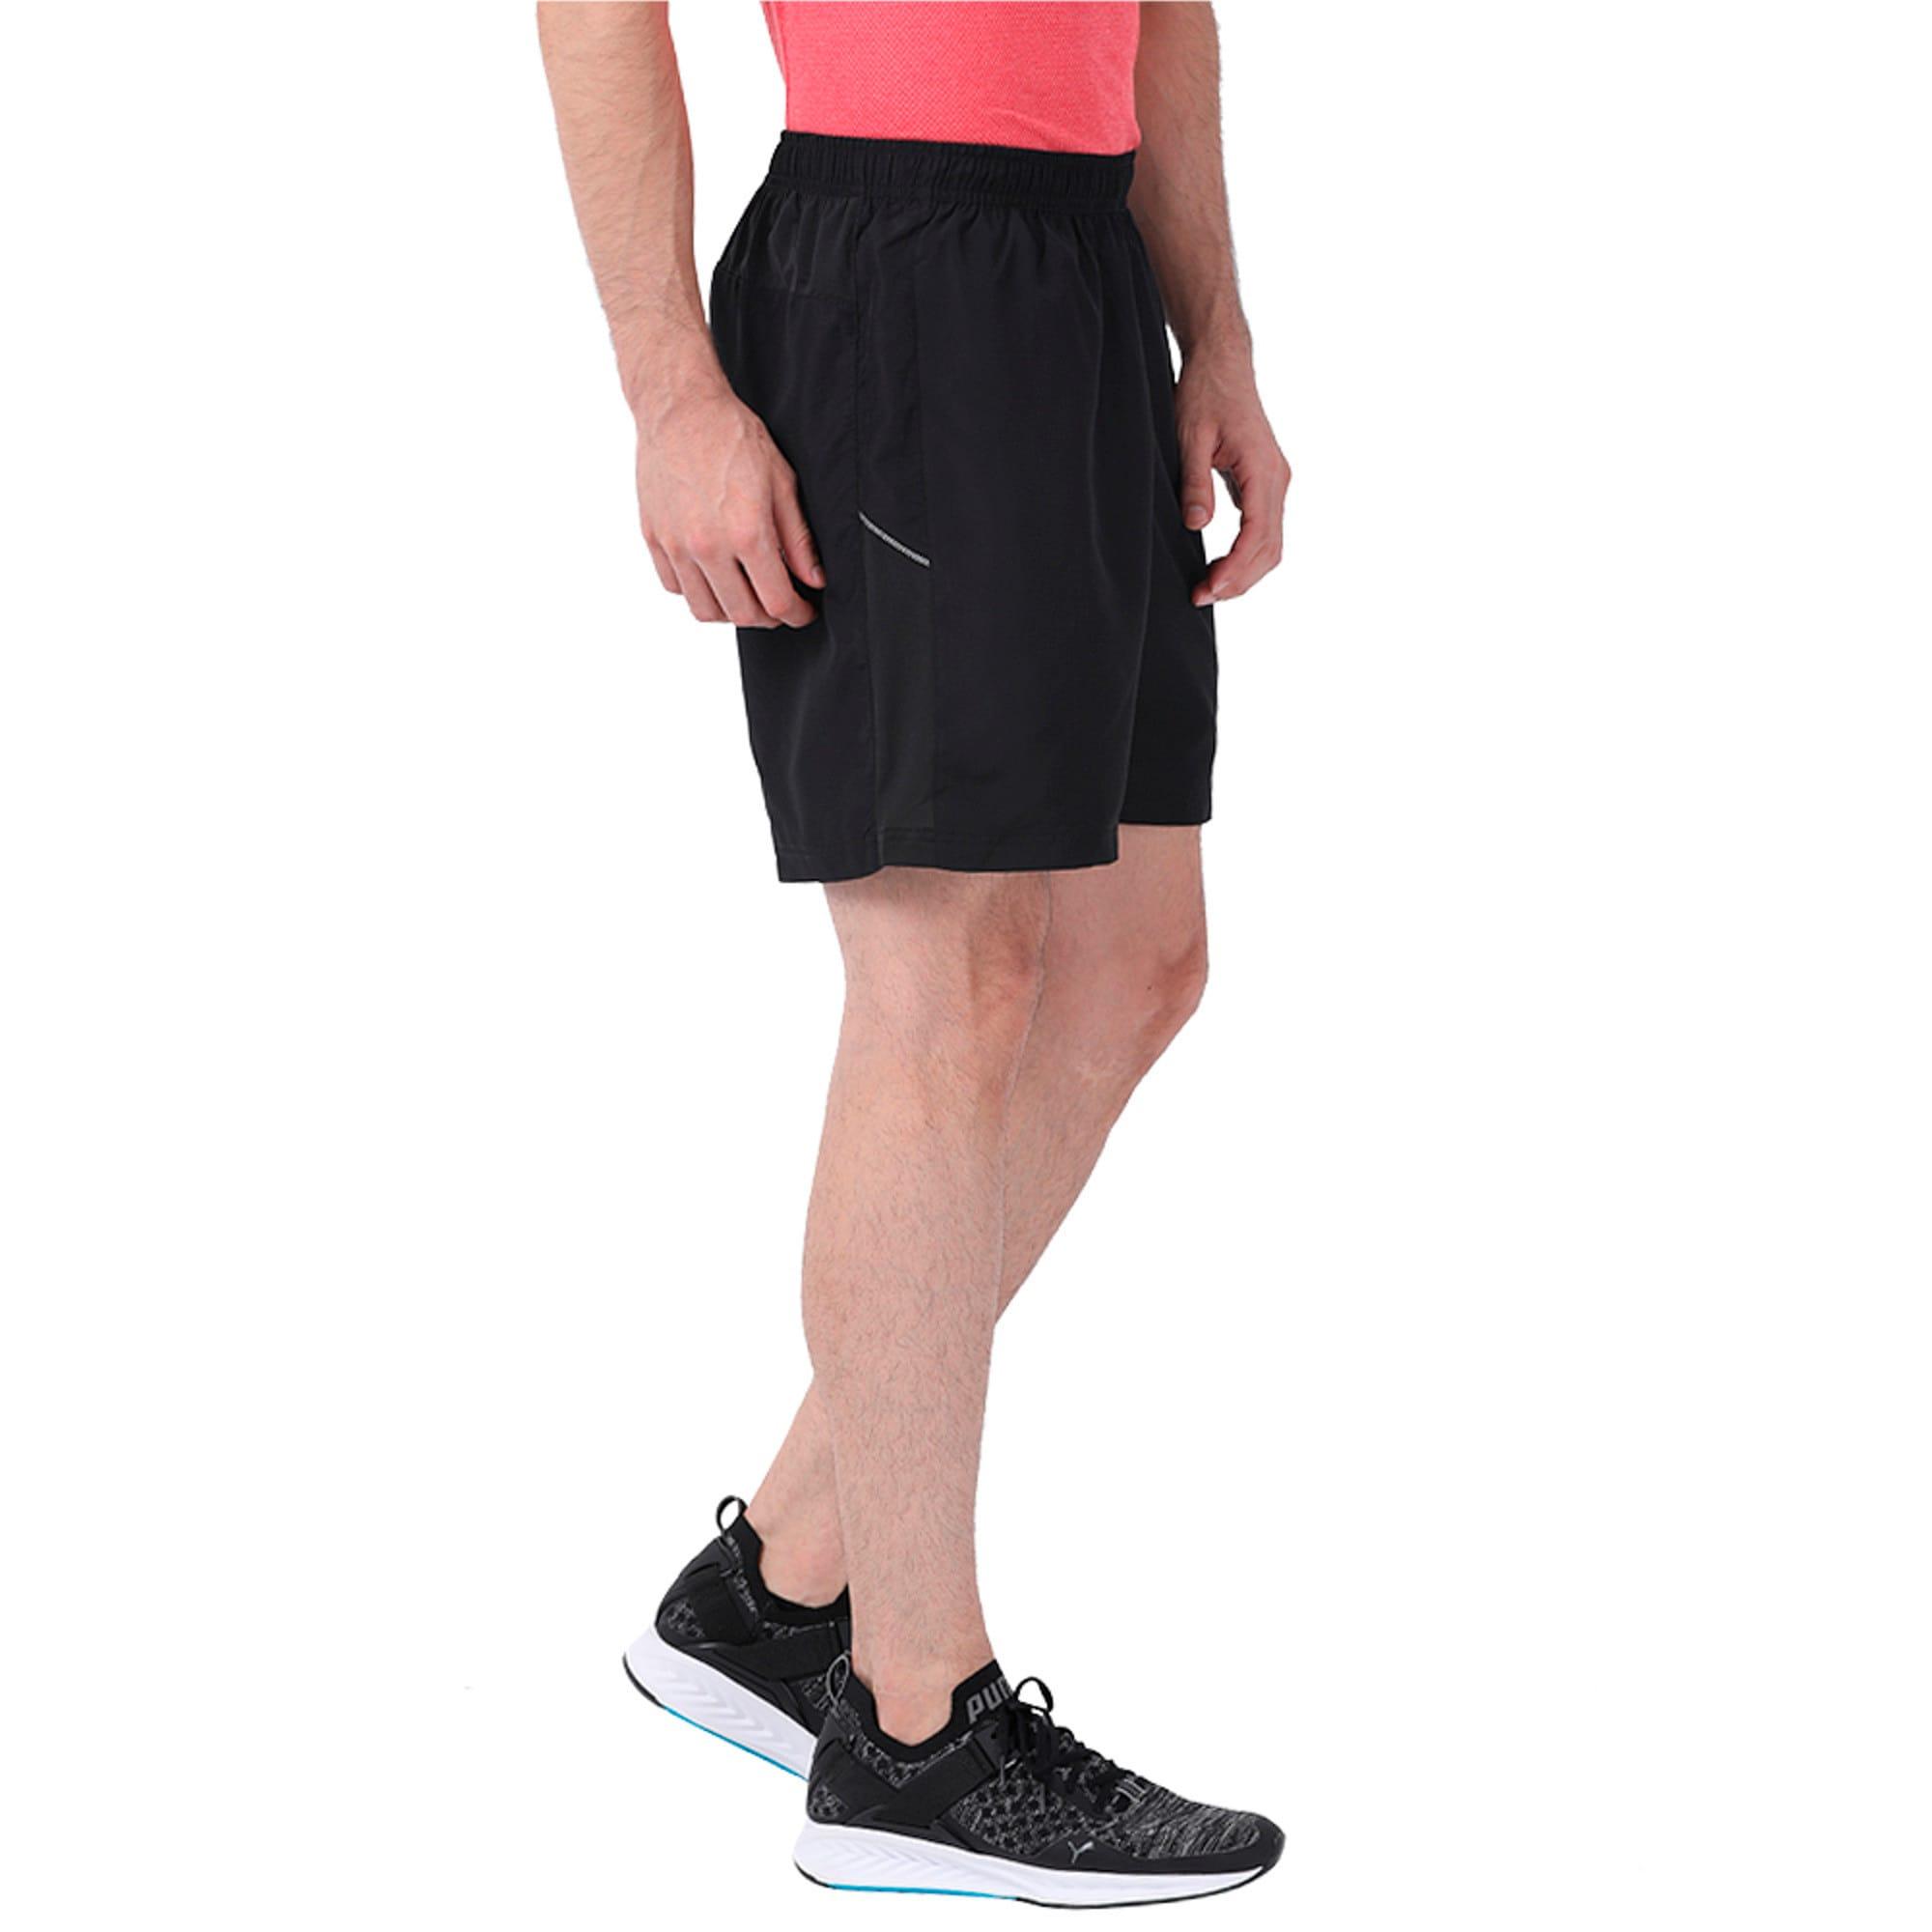 "Thumbnail 2 of Core-Run 7"" Shorts, Puma Black, medium-IND"